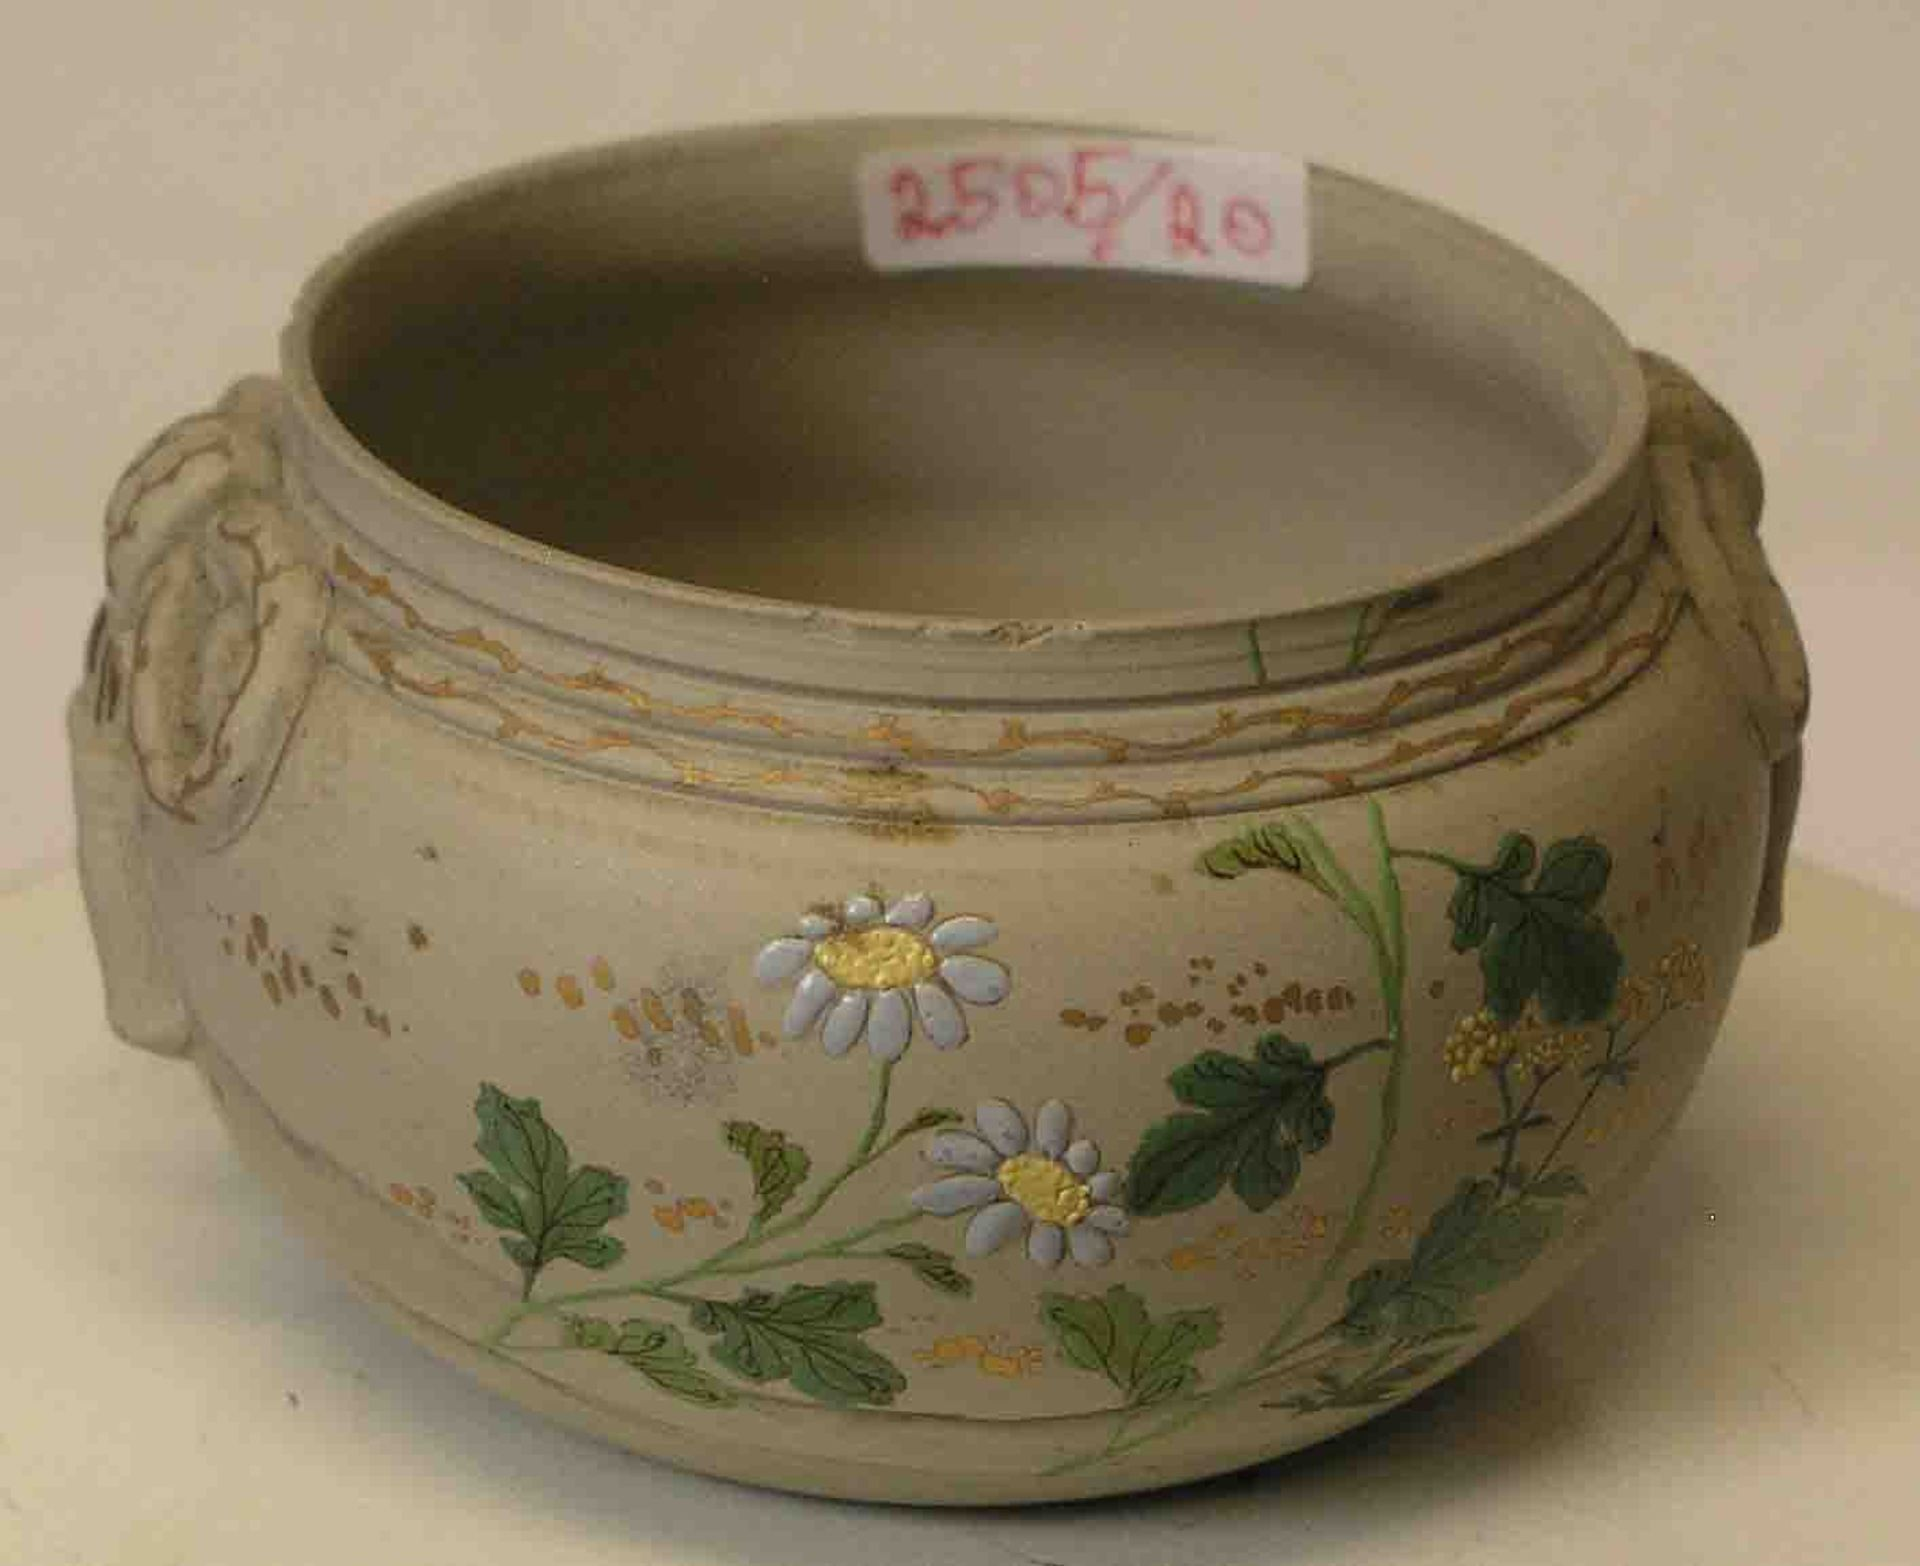 Zierschale. Japan um 1900. Keramik